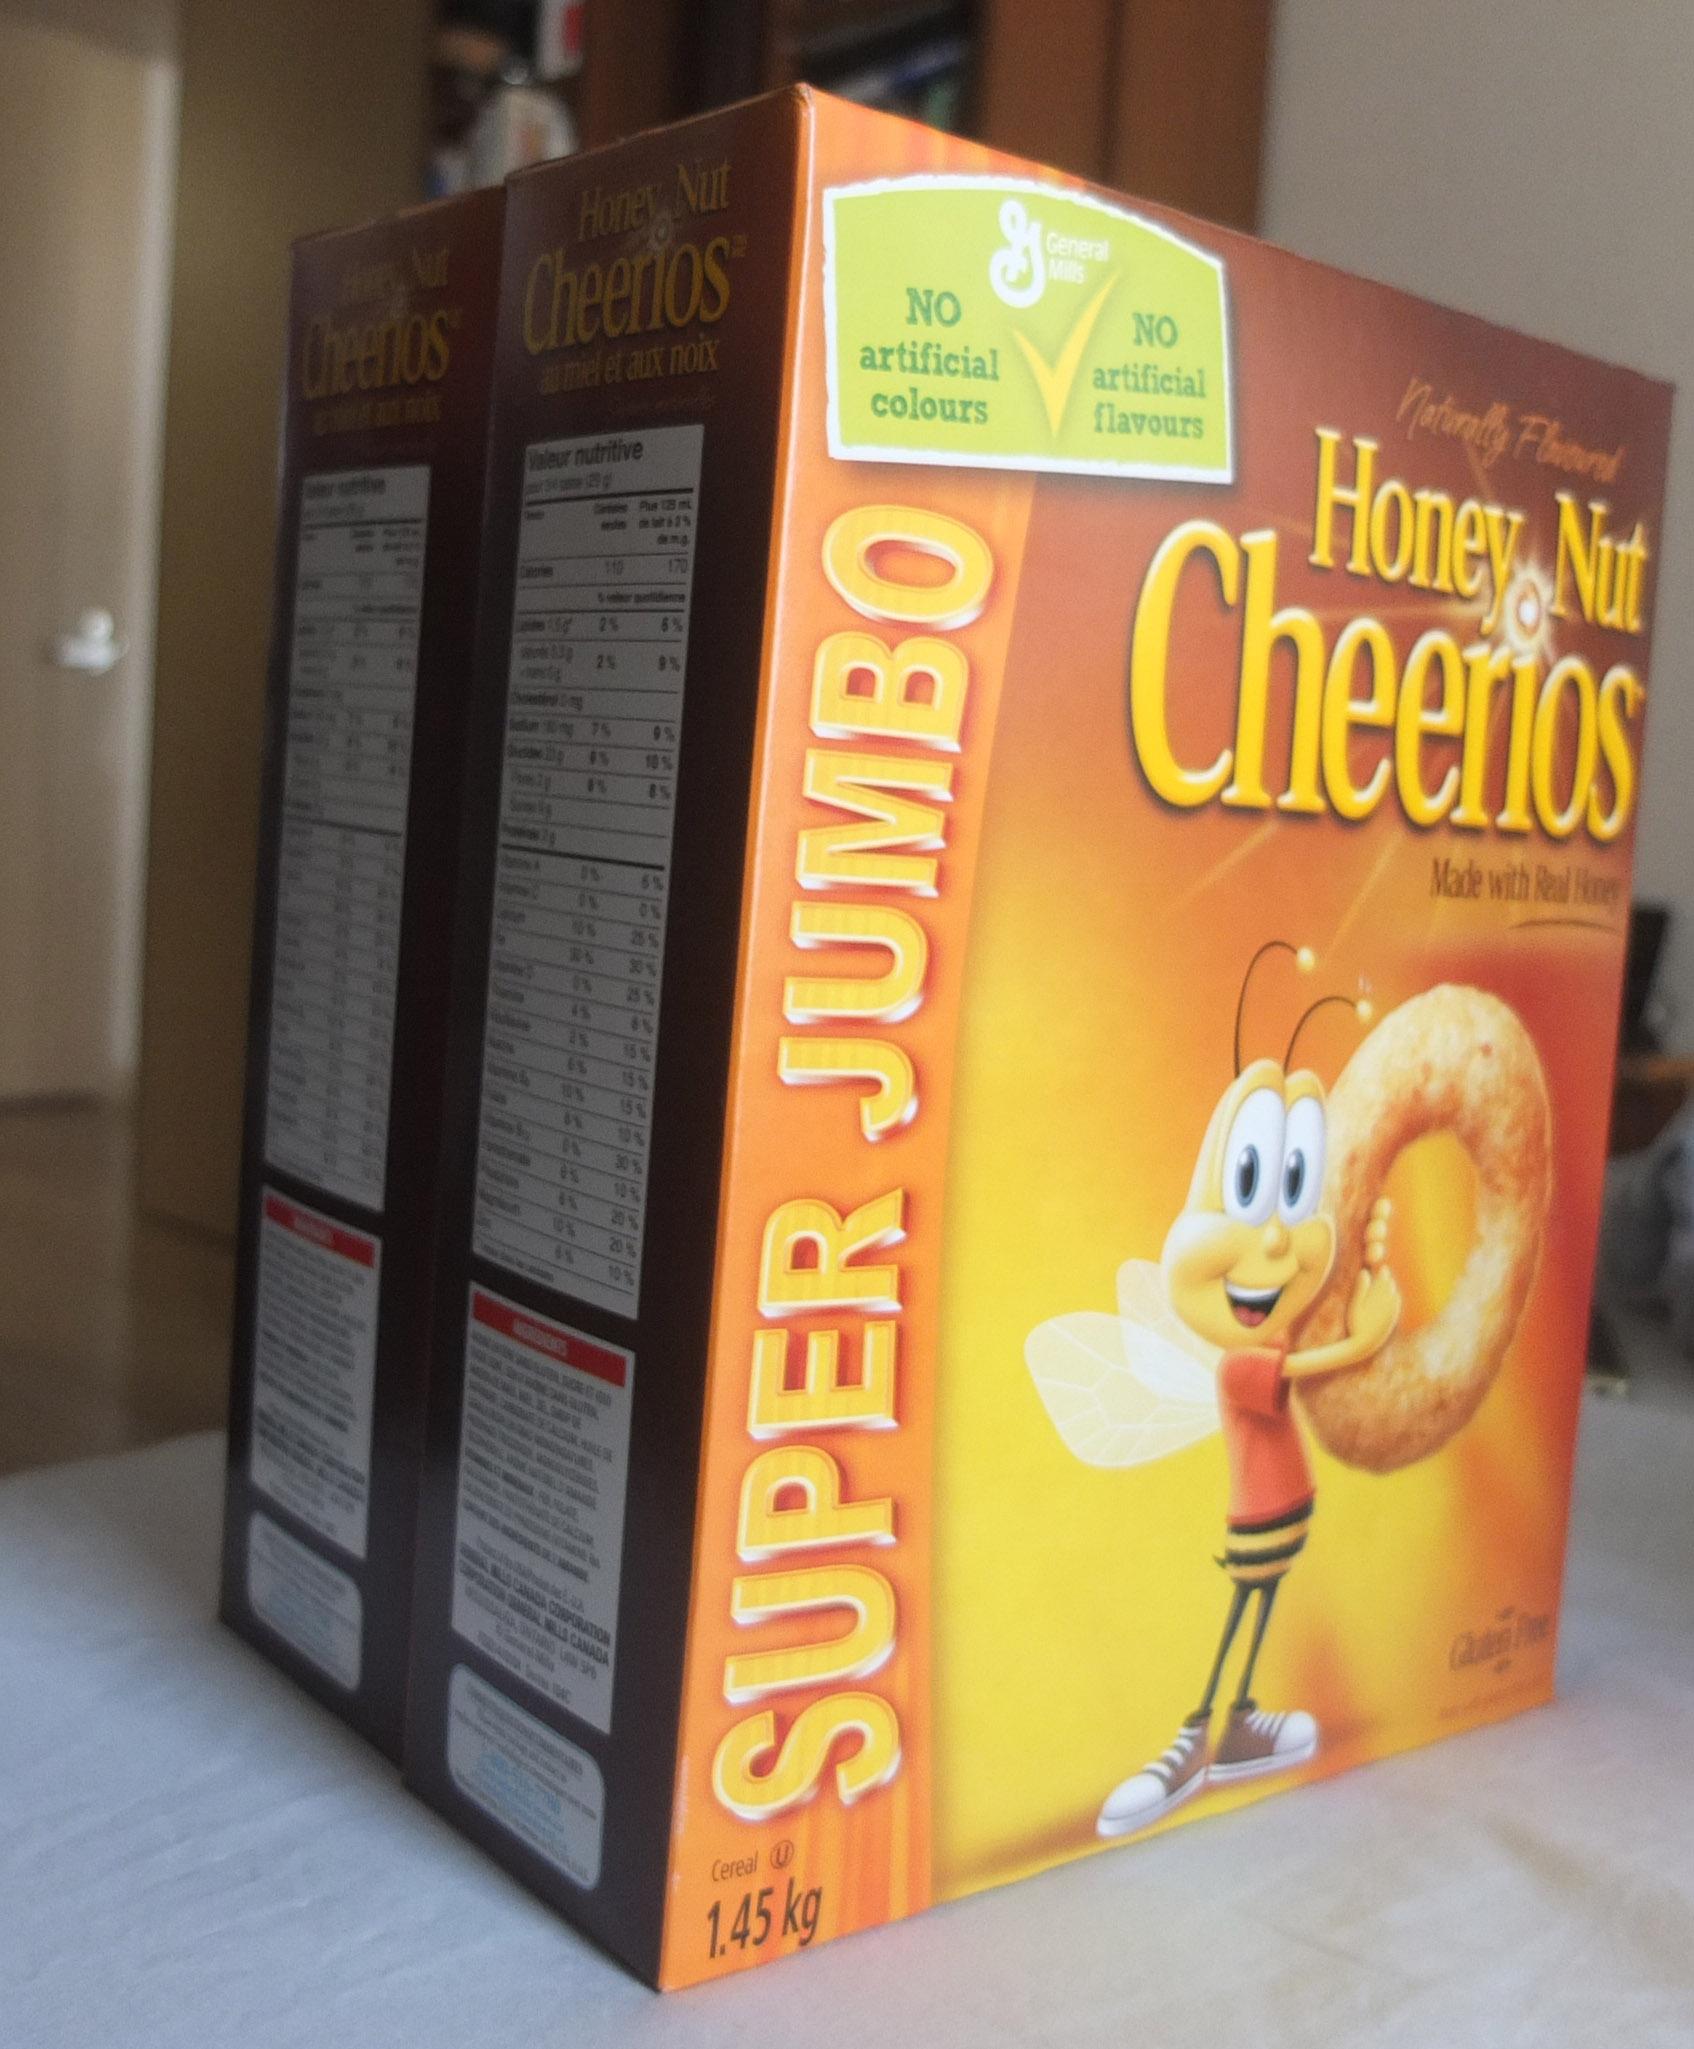 Honey Nut Cheerios_d0193569_10483967.jpg